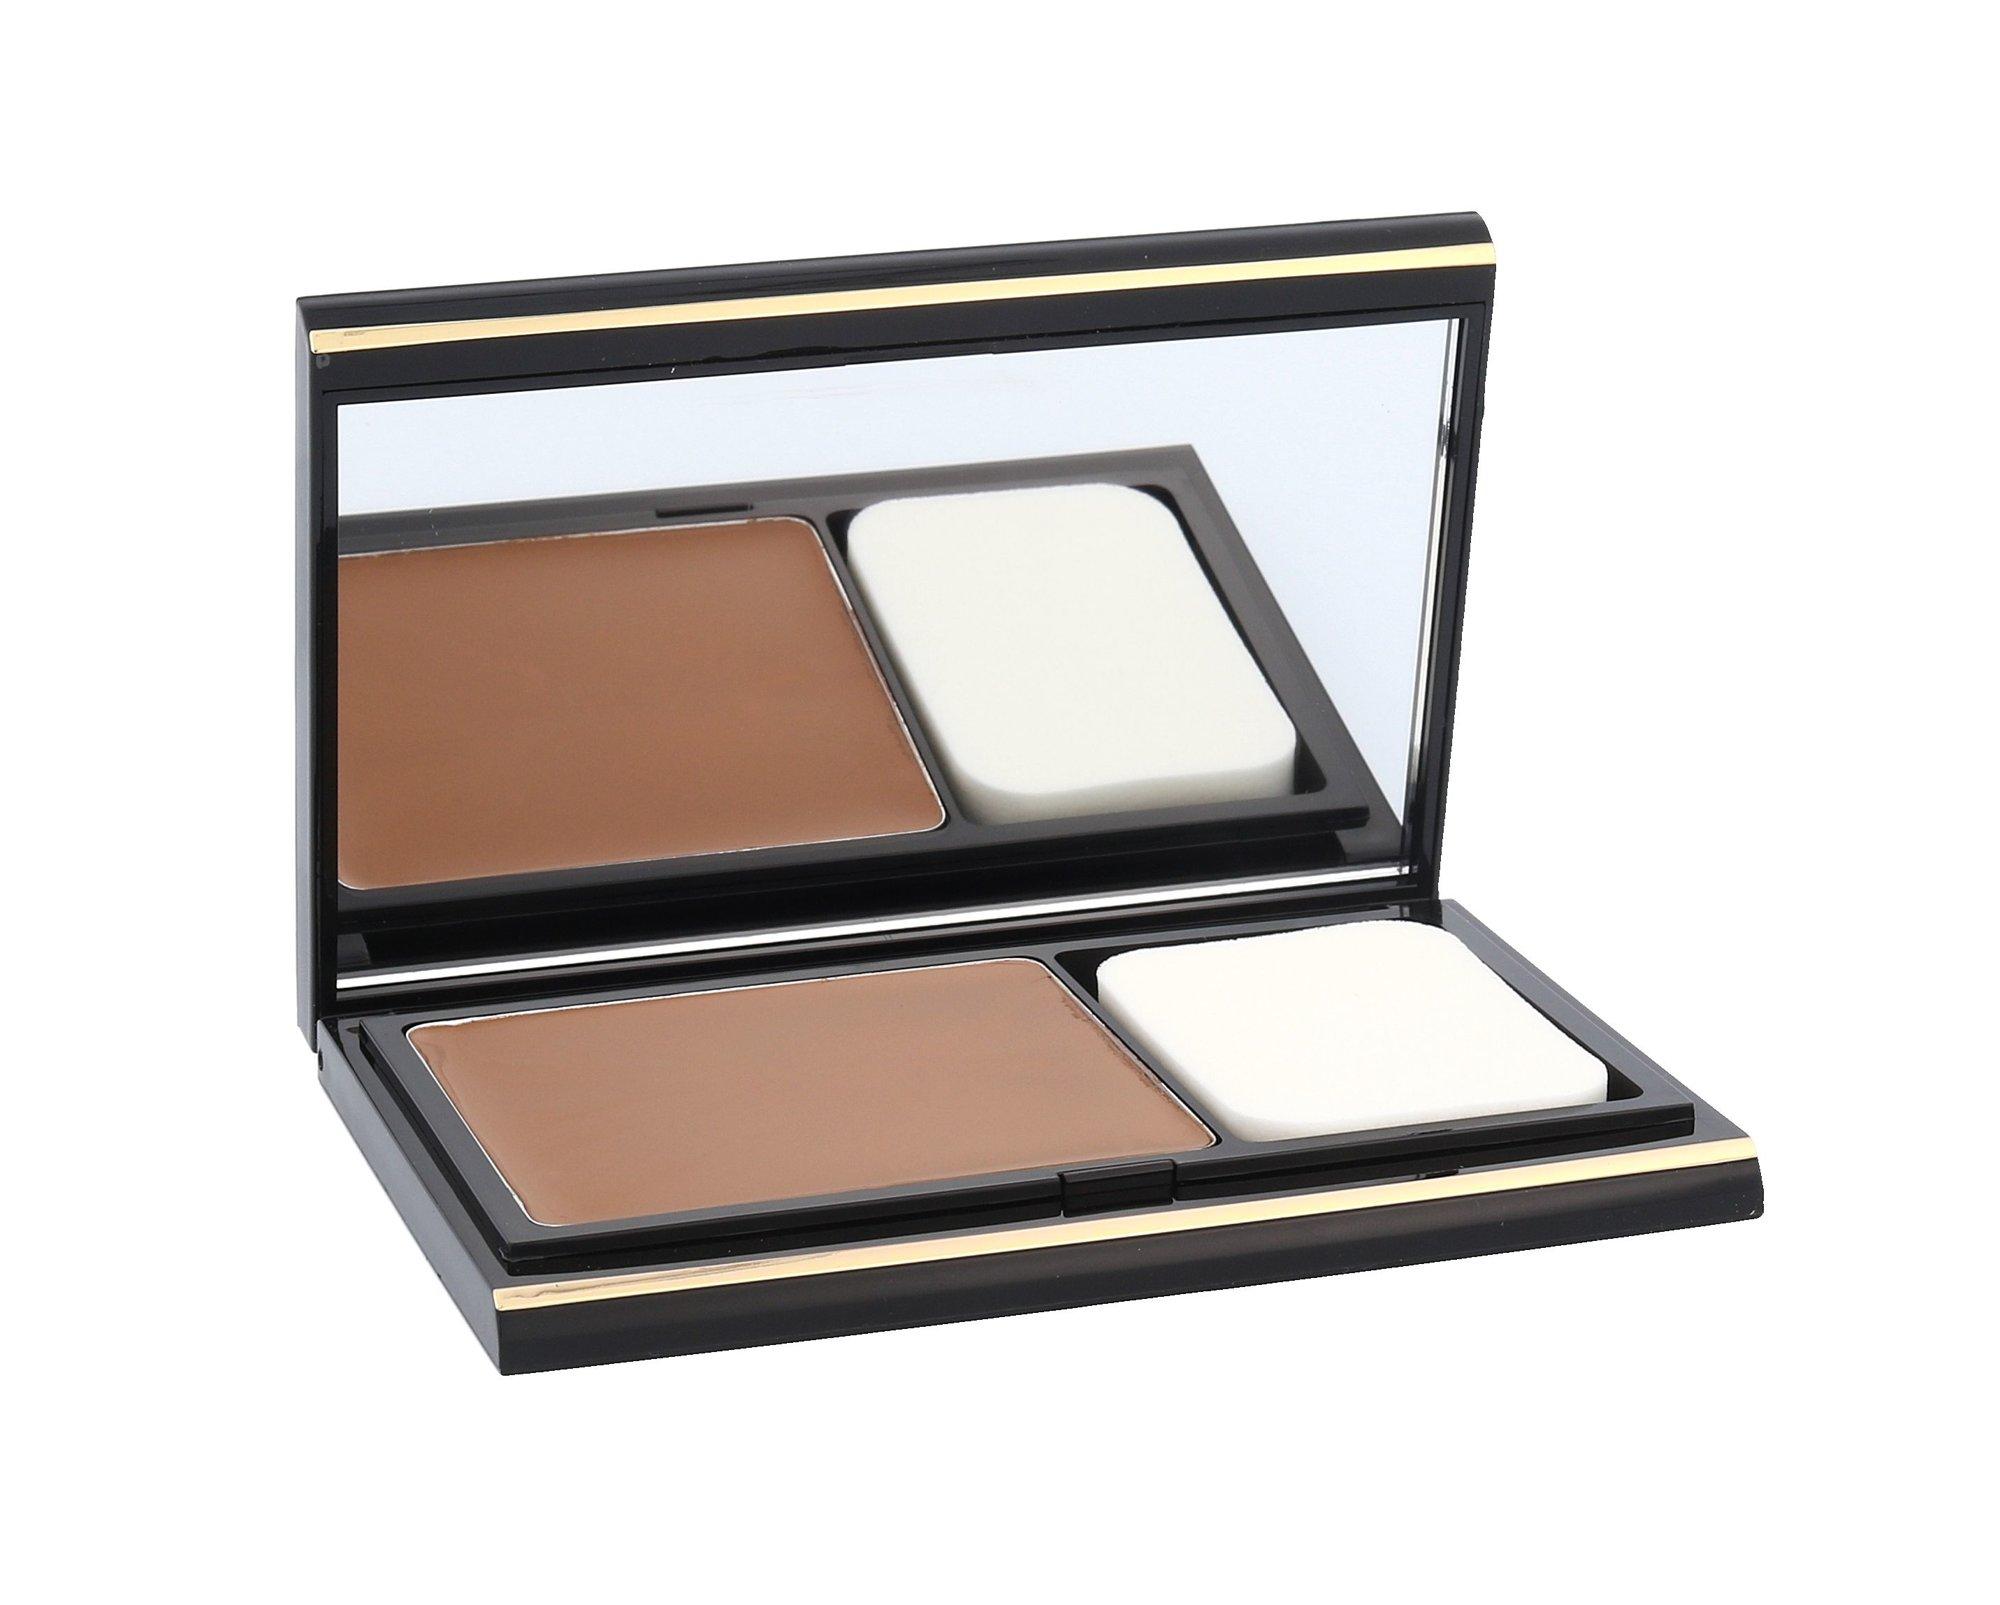 Elizabeth Arden Flawless Finish Cosmetic 23ml 49 Cocoa